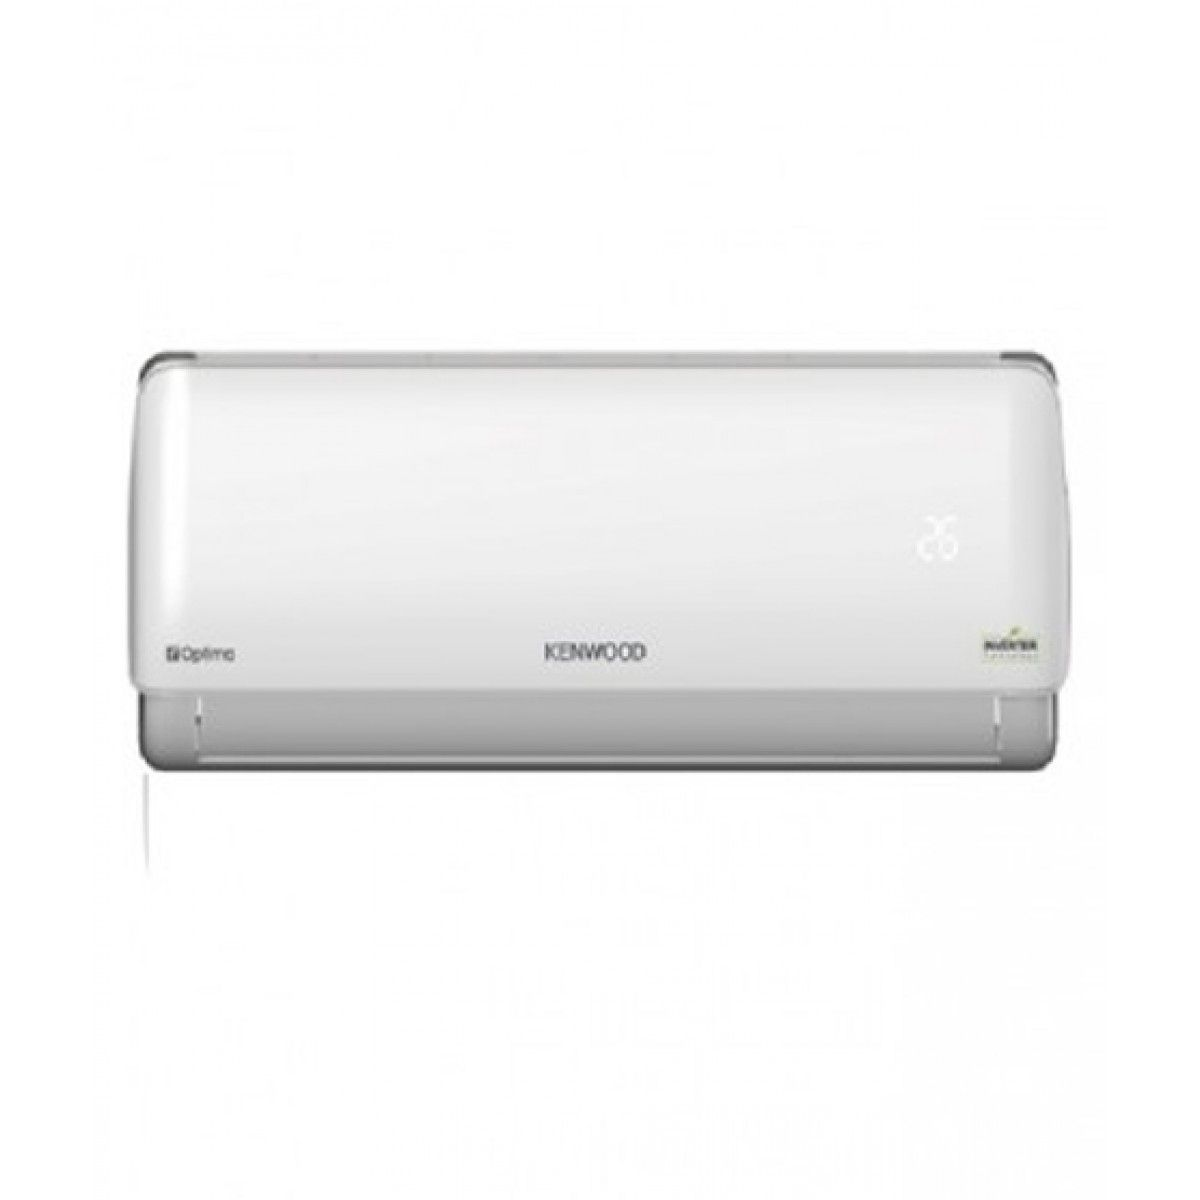 Kenwood E-Optima Inverter AC (KEO-2431S) 2 Ton